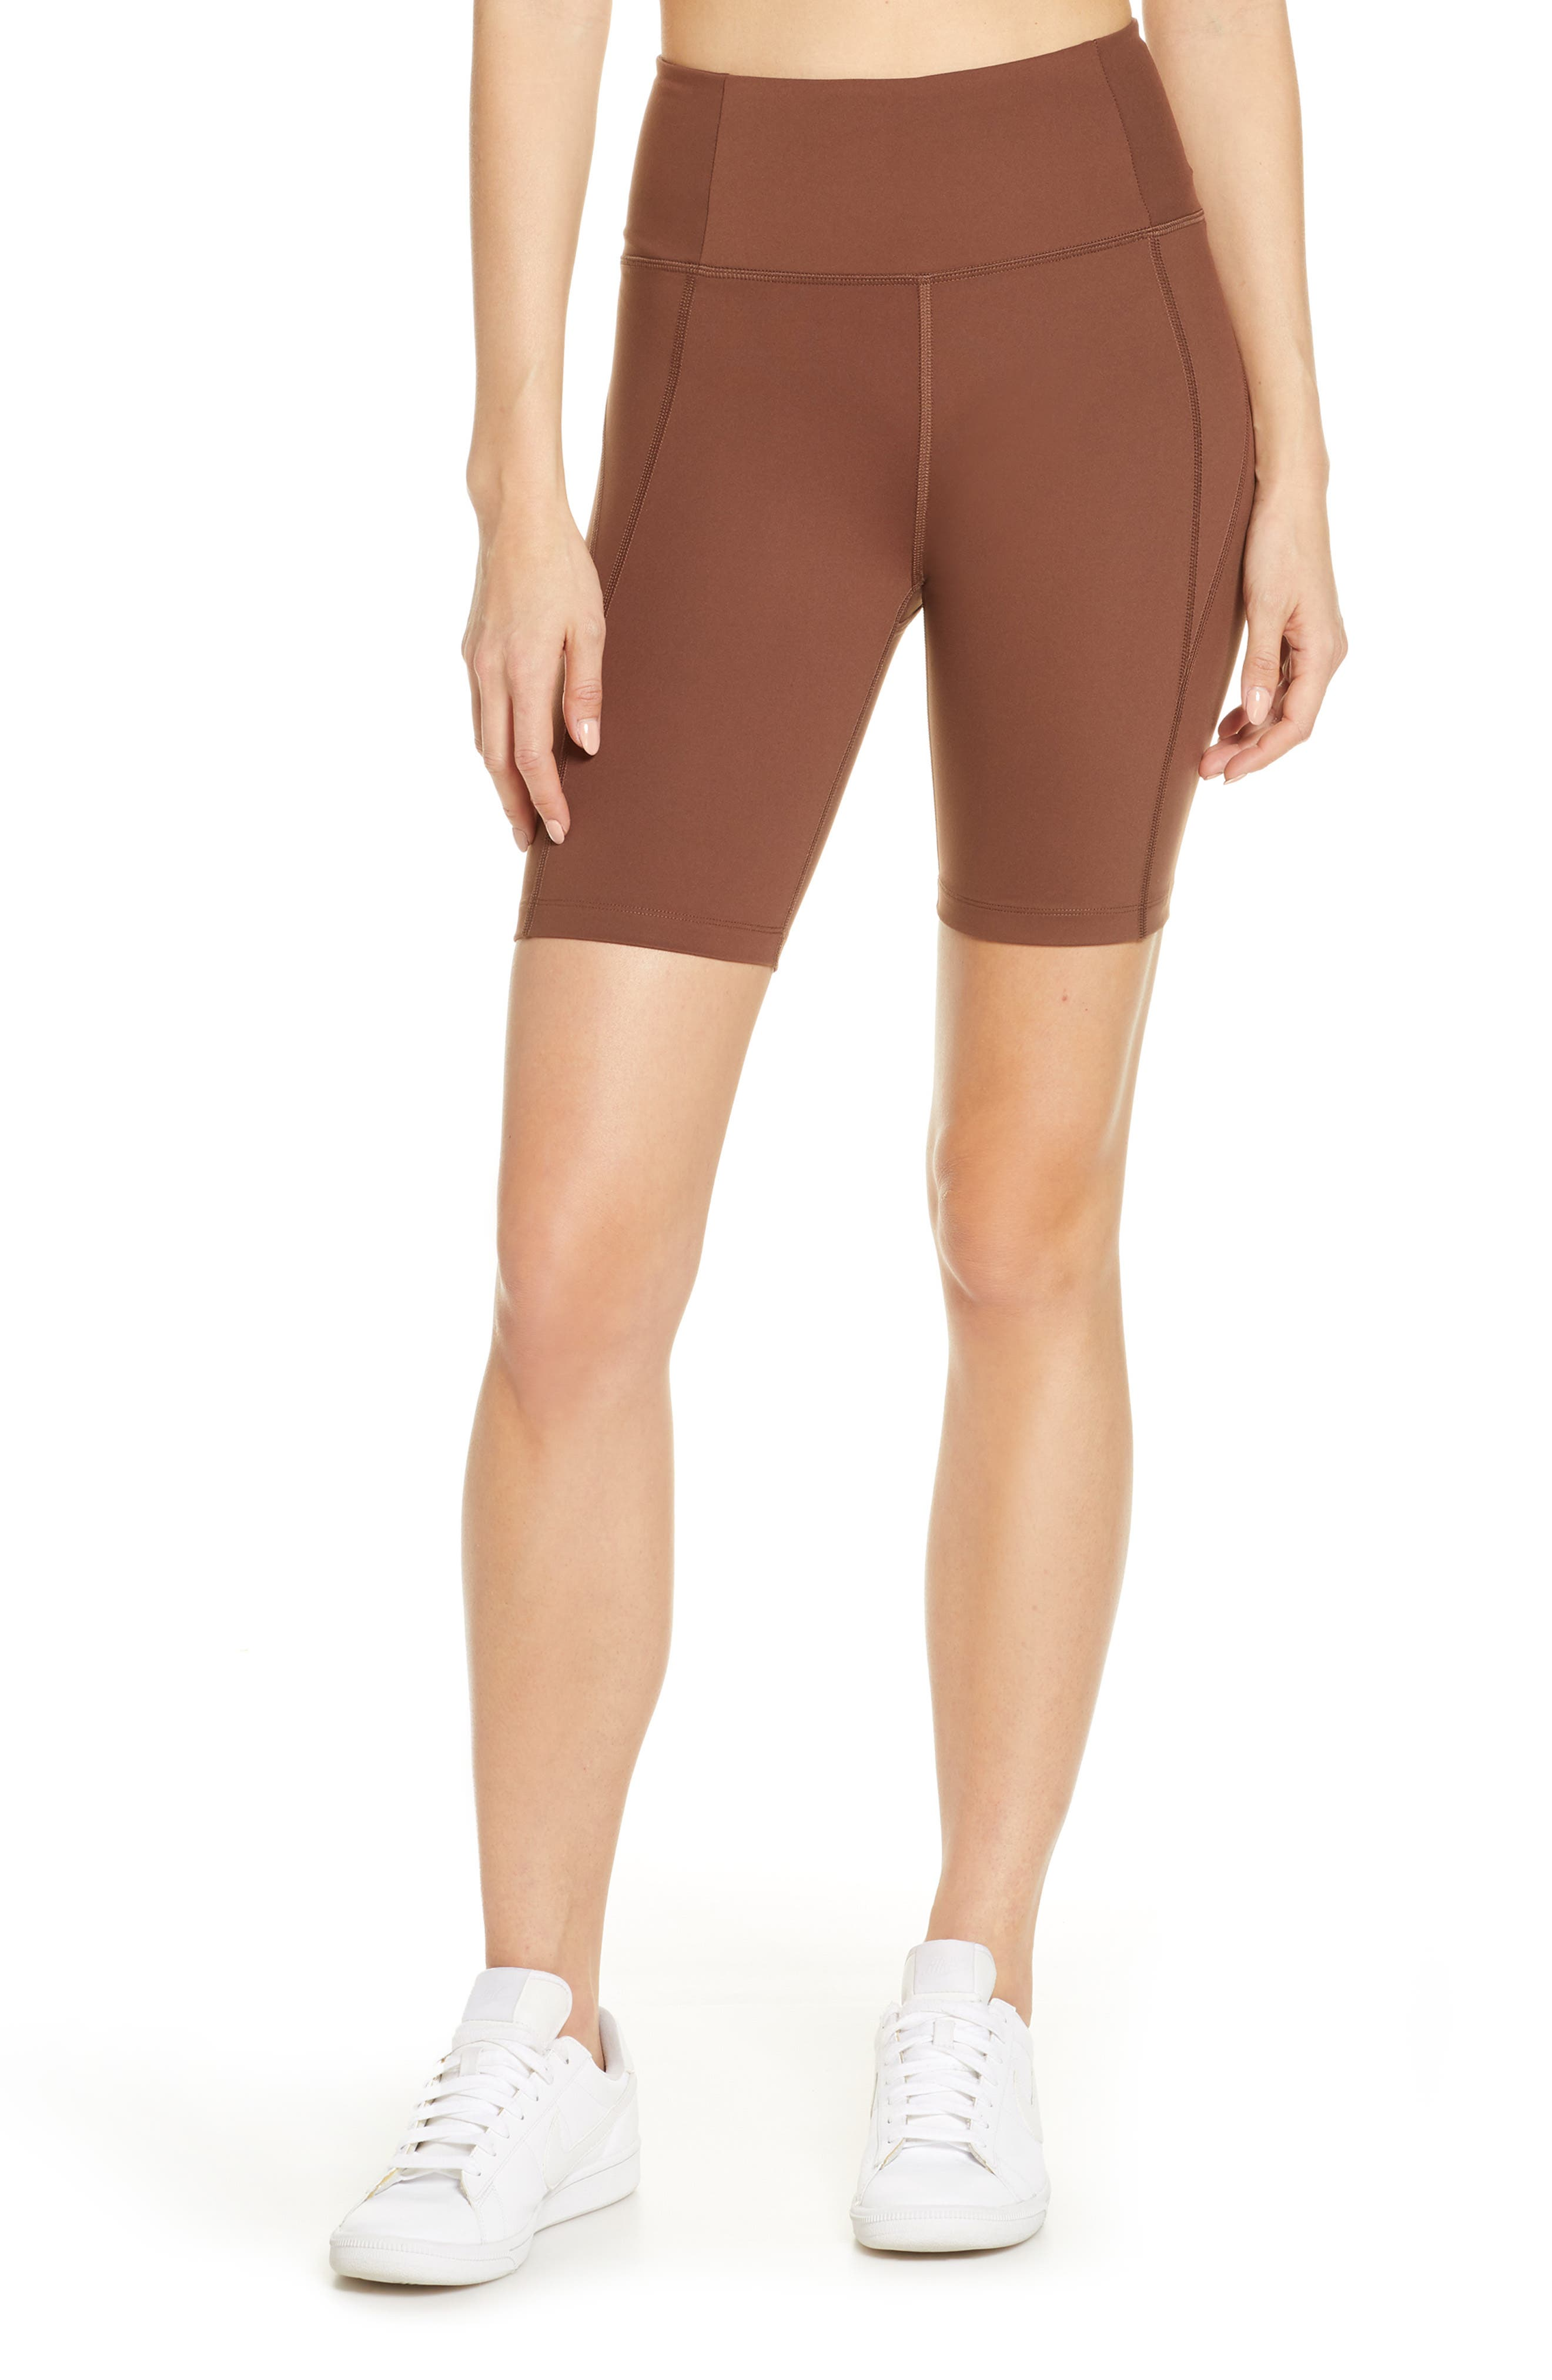 Plus  Women's Girlfriend Collective High Waist Bike Shorts,  3X-Large - Brown